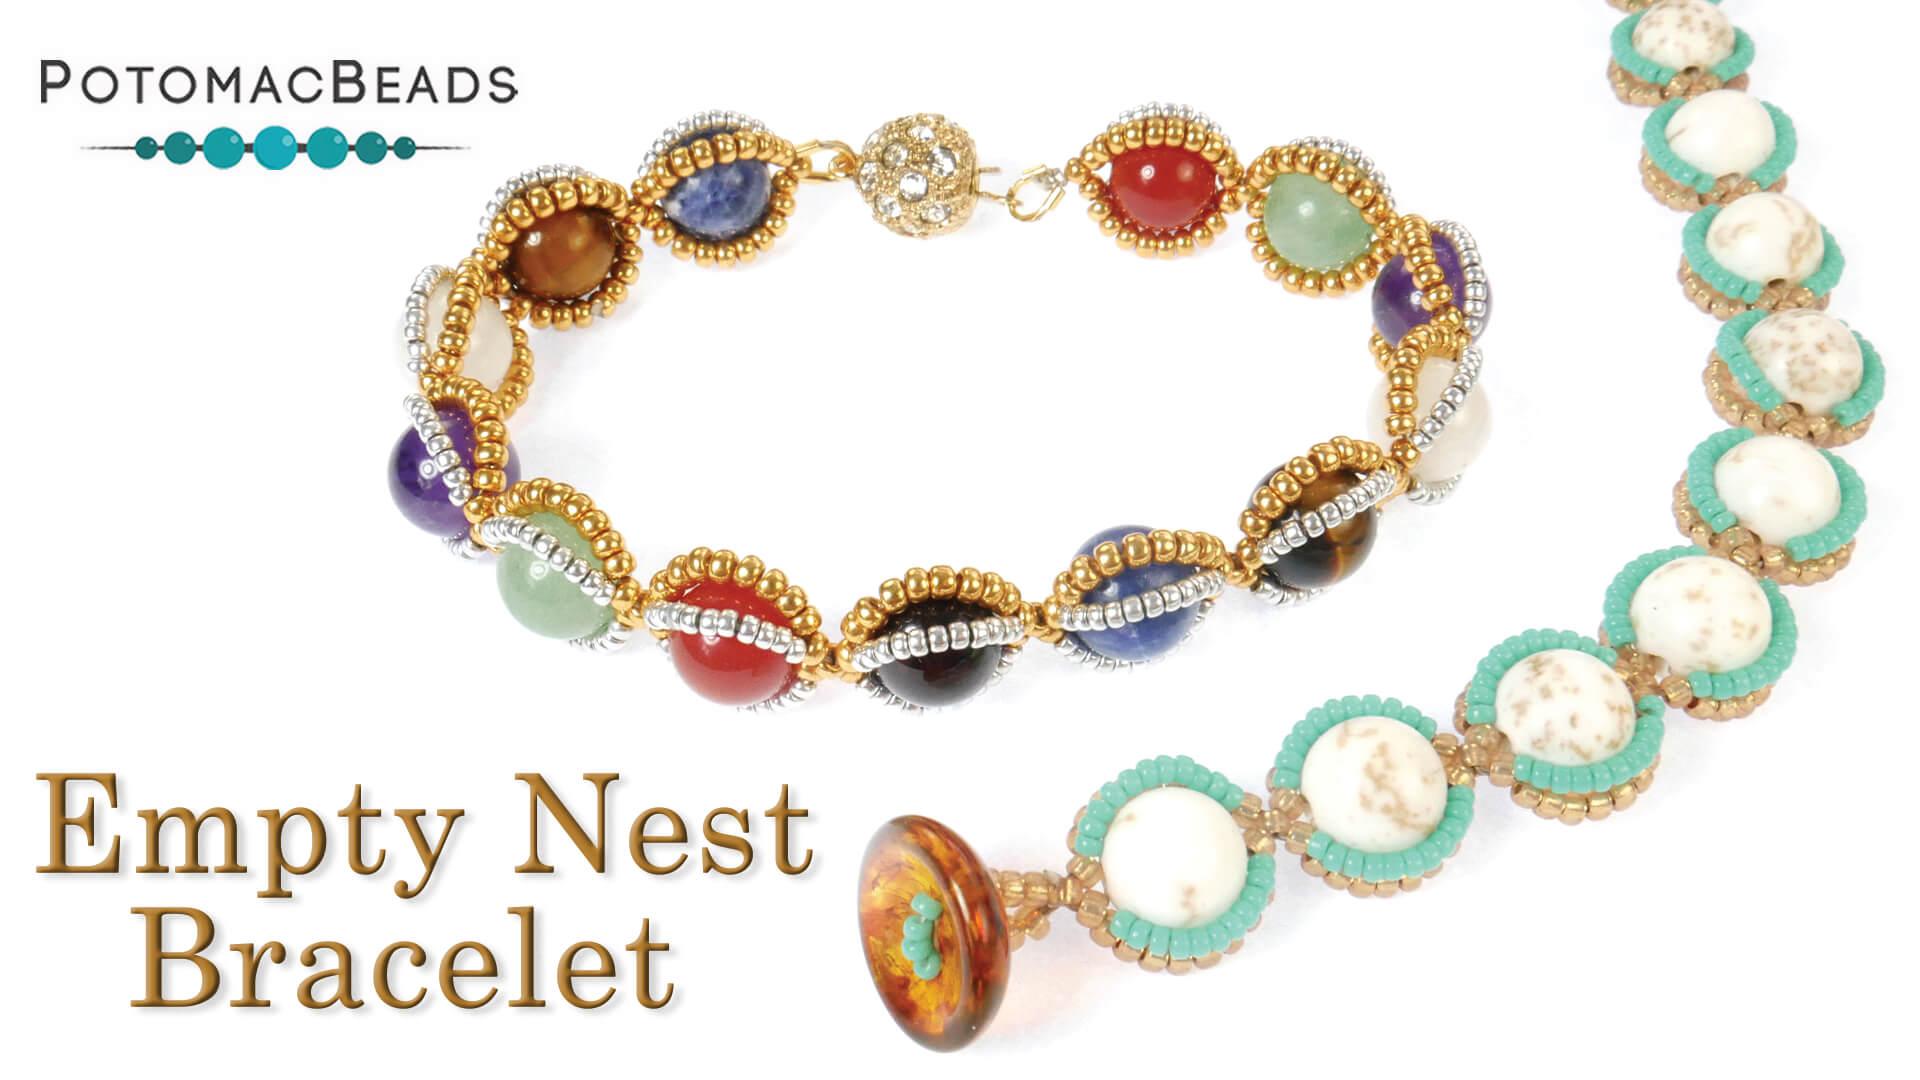 How to Bead Jewelry / Videos Sorted by Beads / Gemstone Videos / Empty Nest Bracelet Tutorial